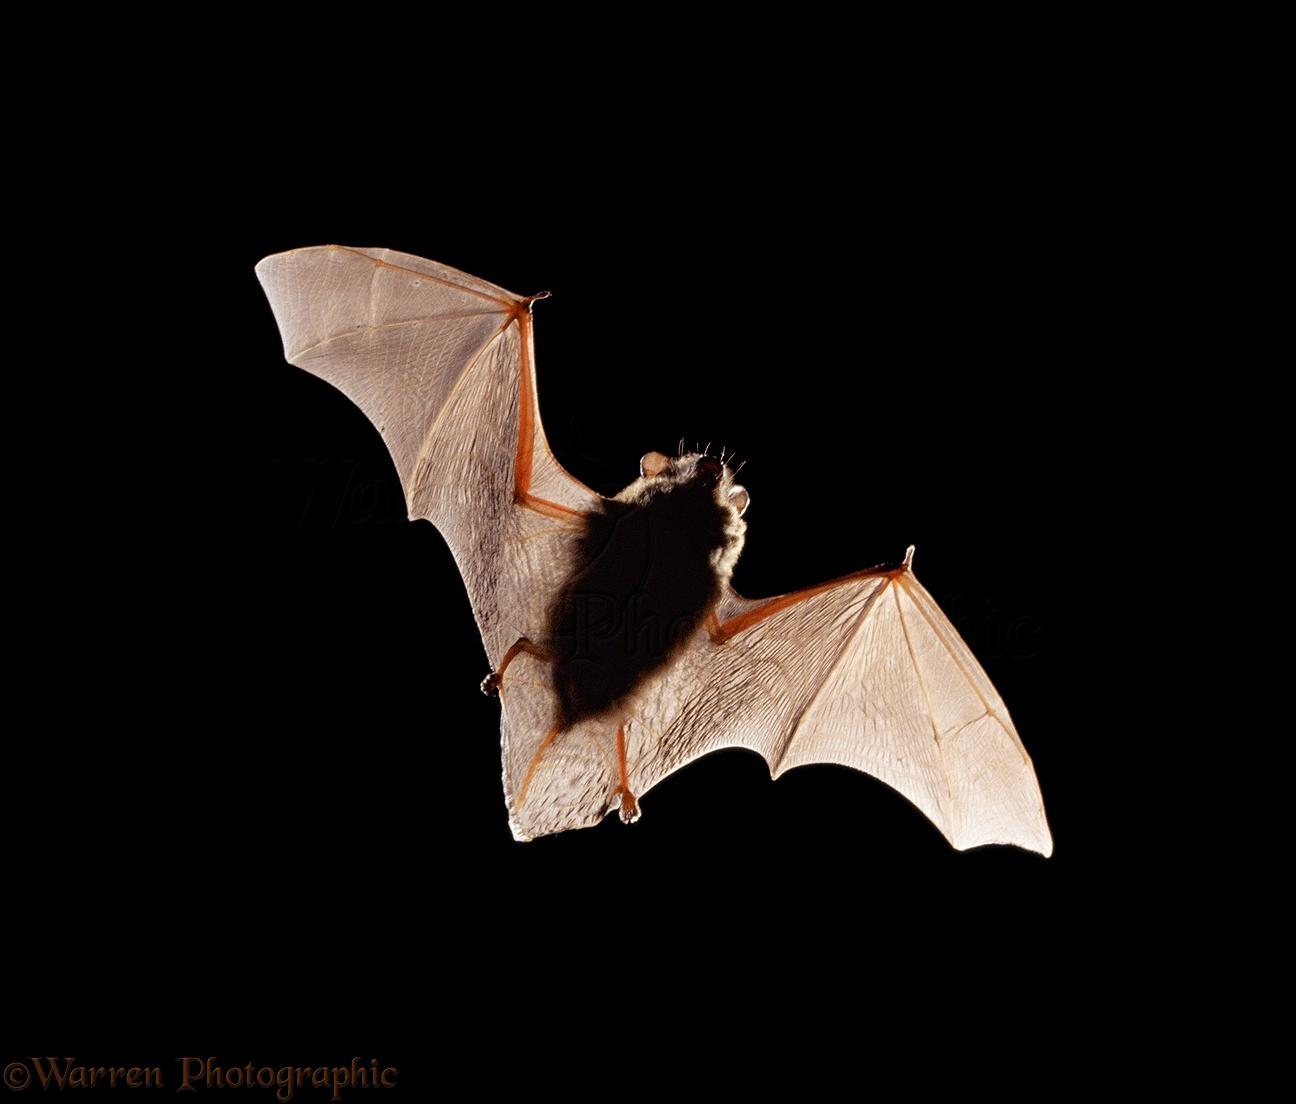 pipistrelle bat photo wp11454